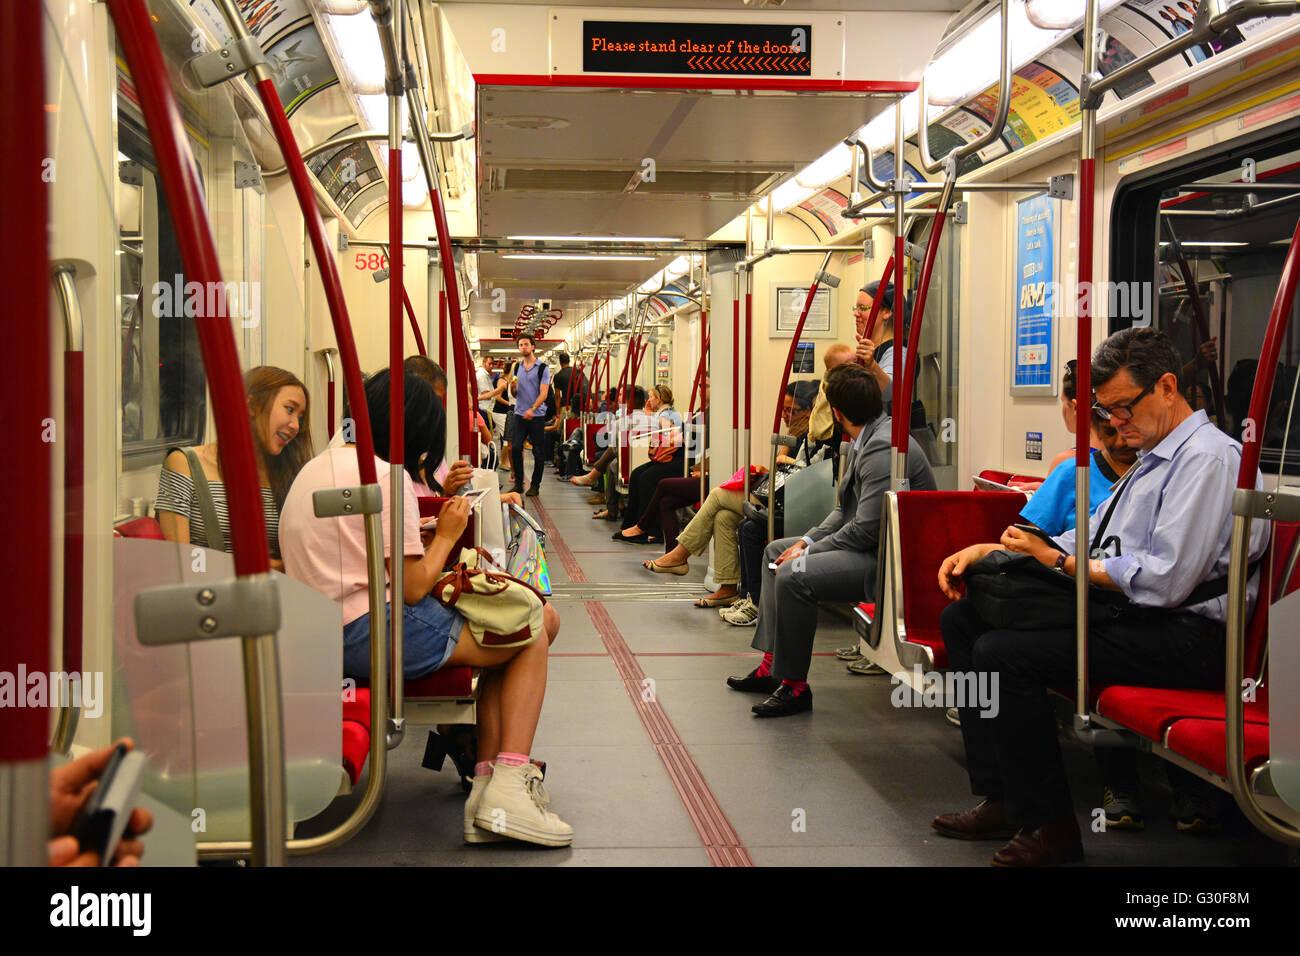 Subway passengers,Toronto, Canada - Stock Image